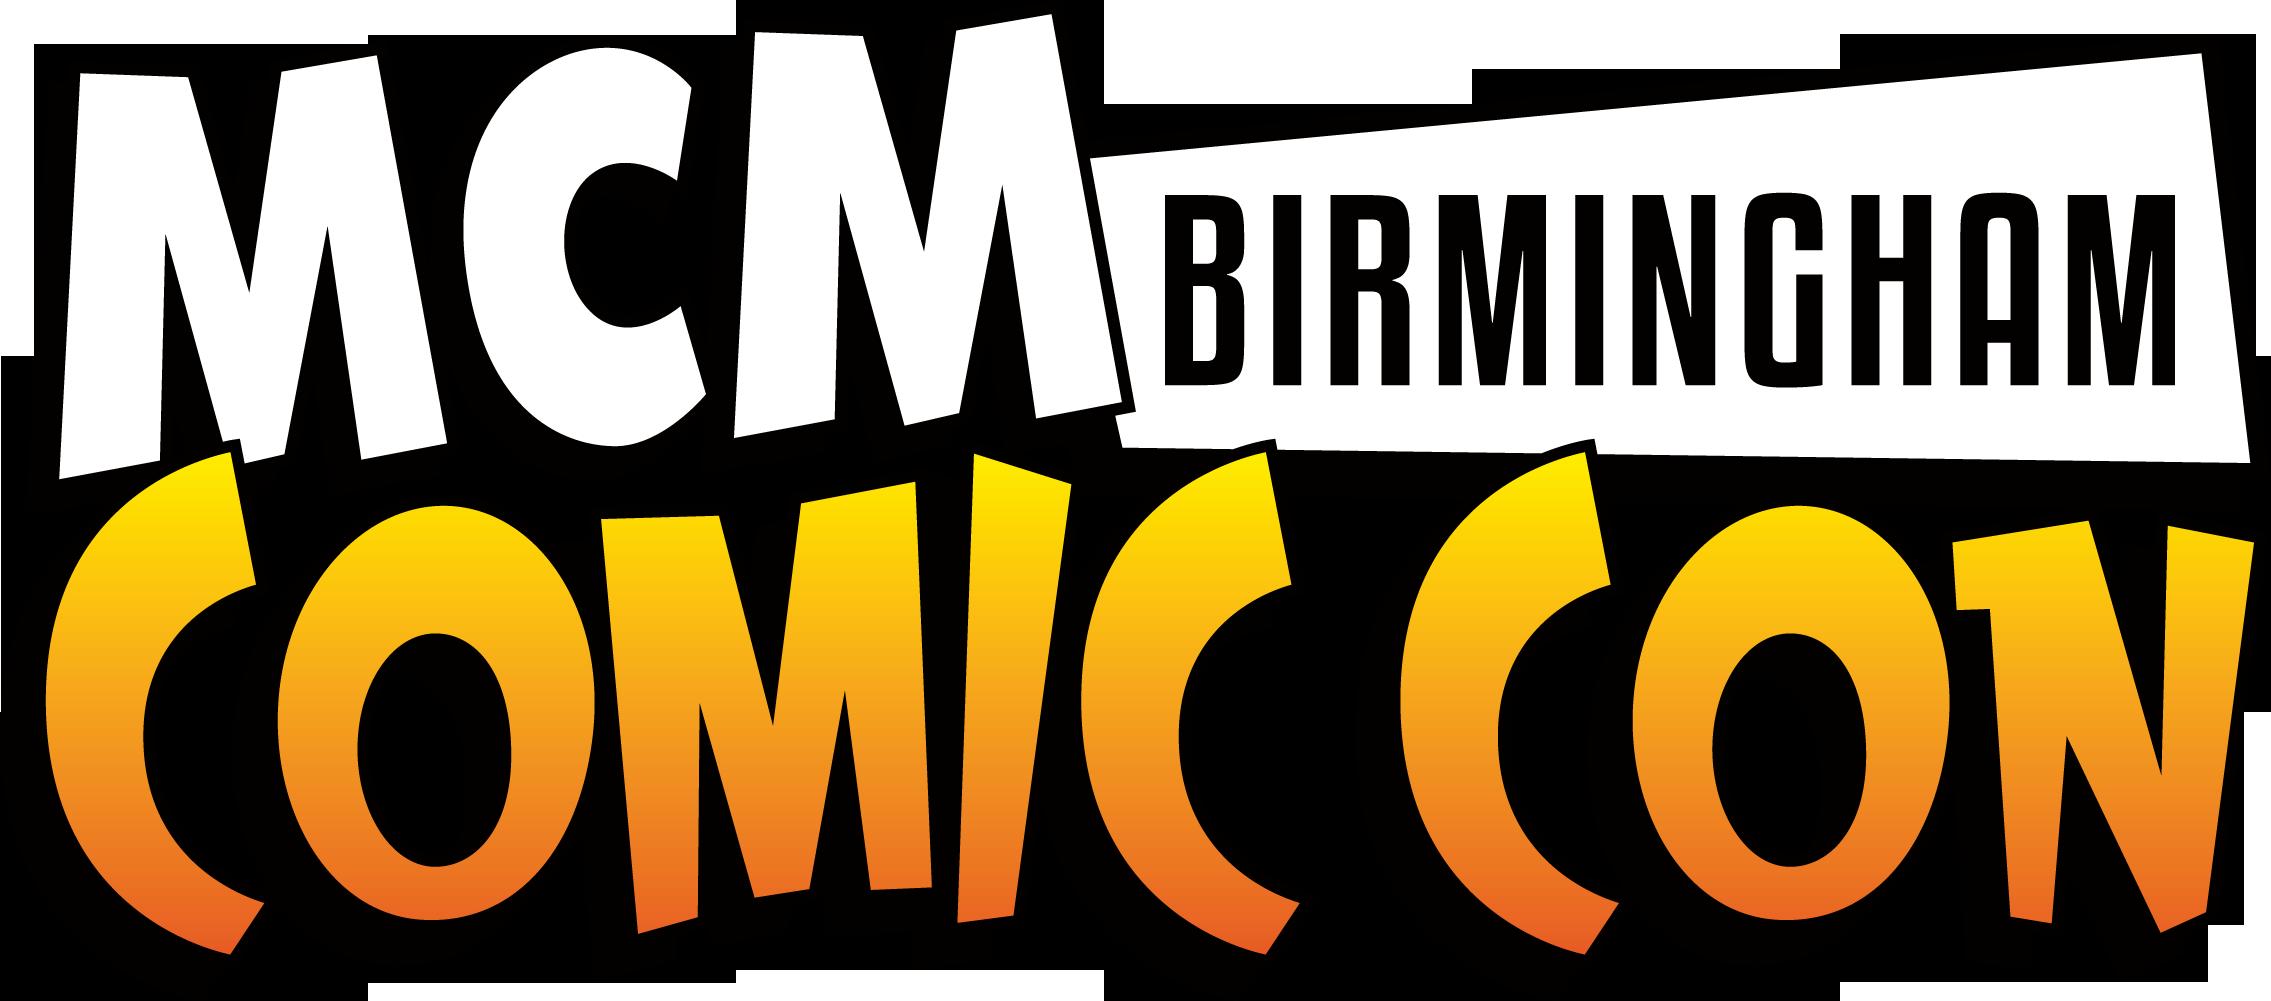 mcm-comiccon-birmingham.png